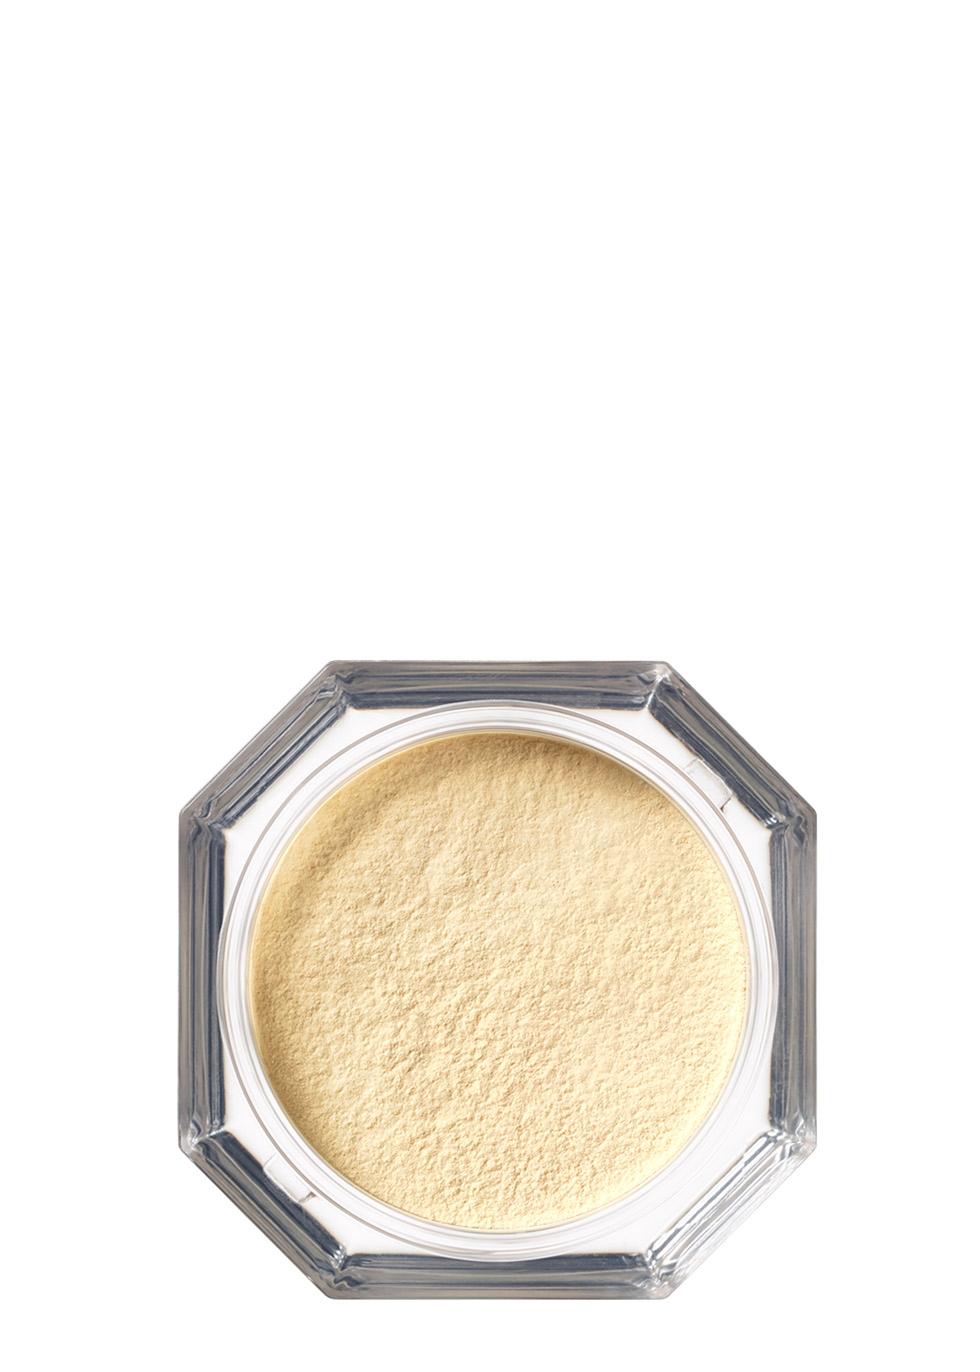 Pro Filt'r Mini Instant Retouch Setting Powder - Butter - FENTY BEAUTY